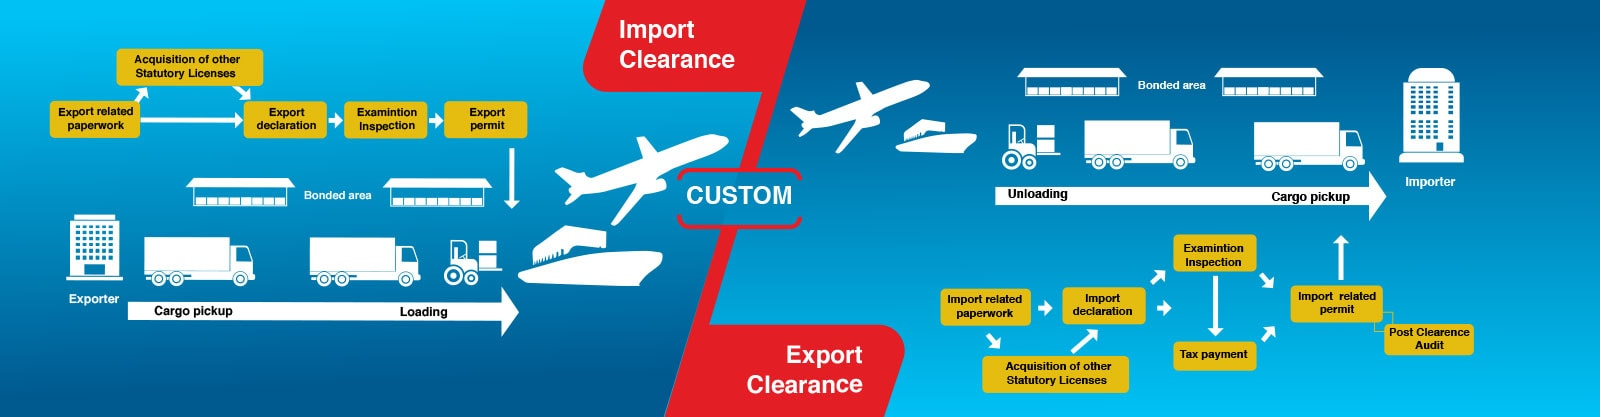 Custom Clearing Service alphatrans